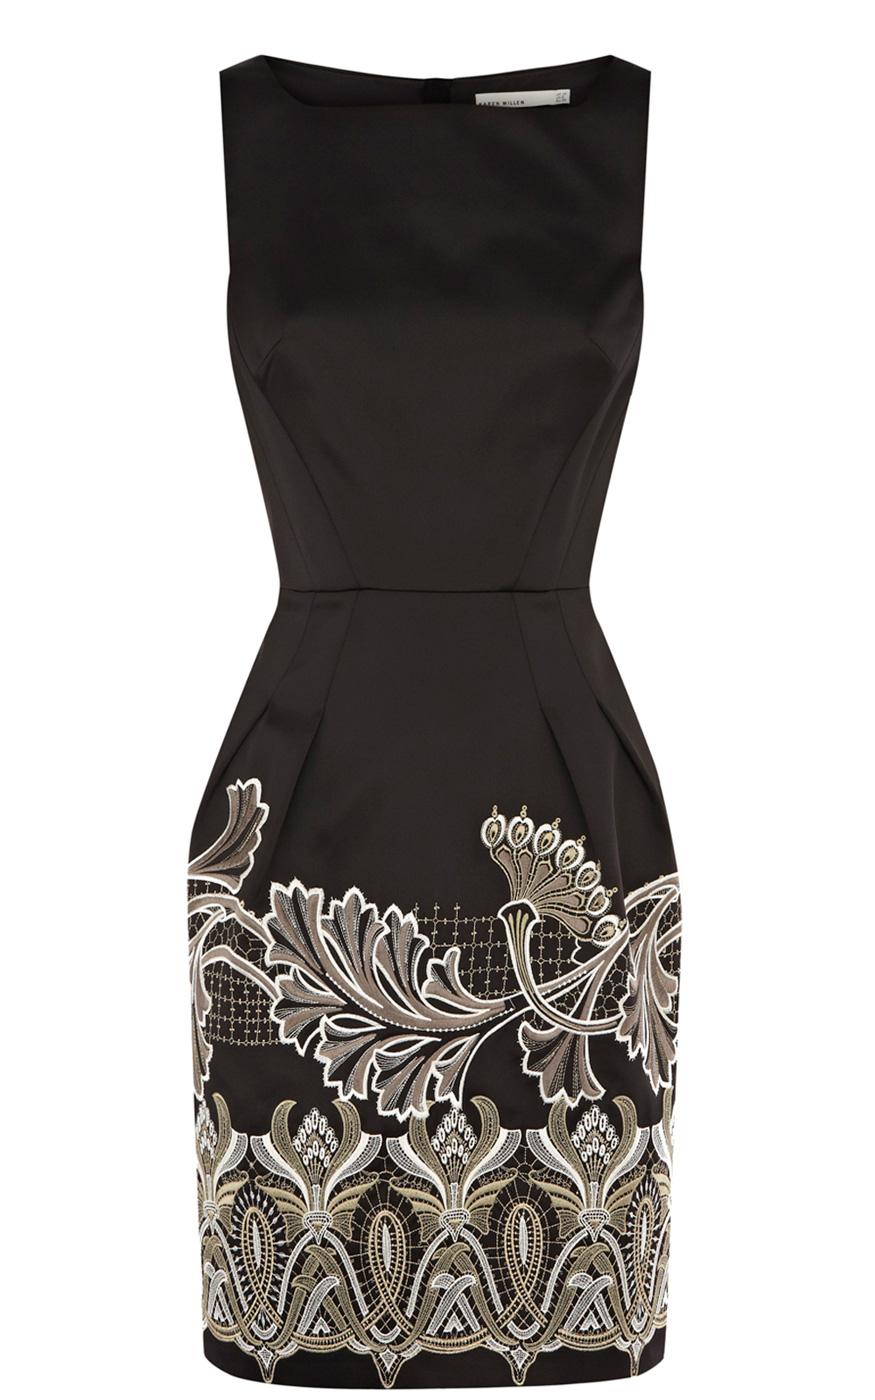 Black Day Dress - BLACK ORIENTAL EMBROIDERY DRESS | UsTrendy